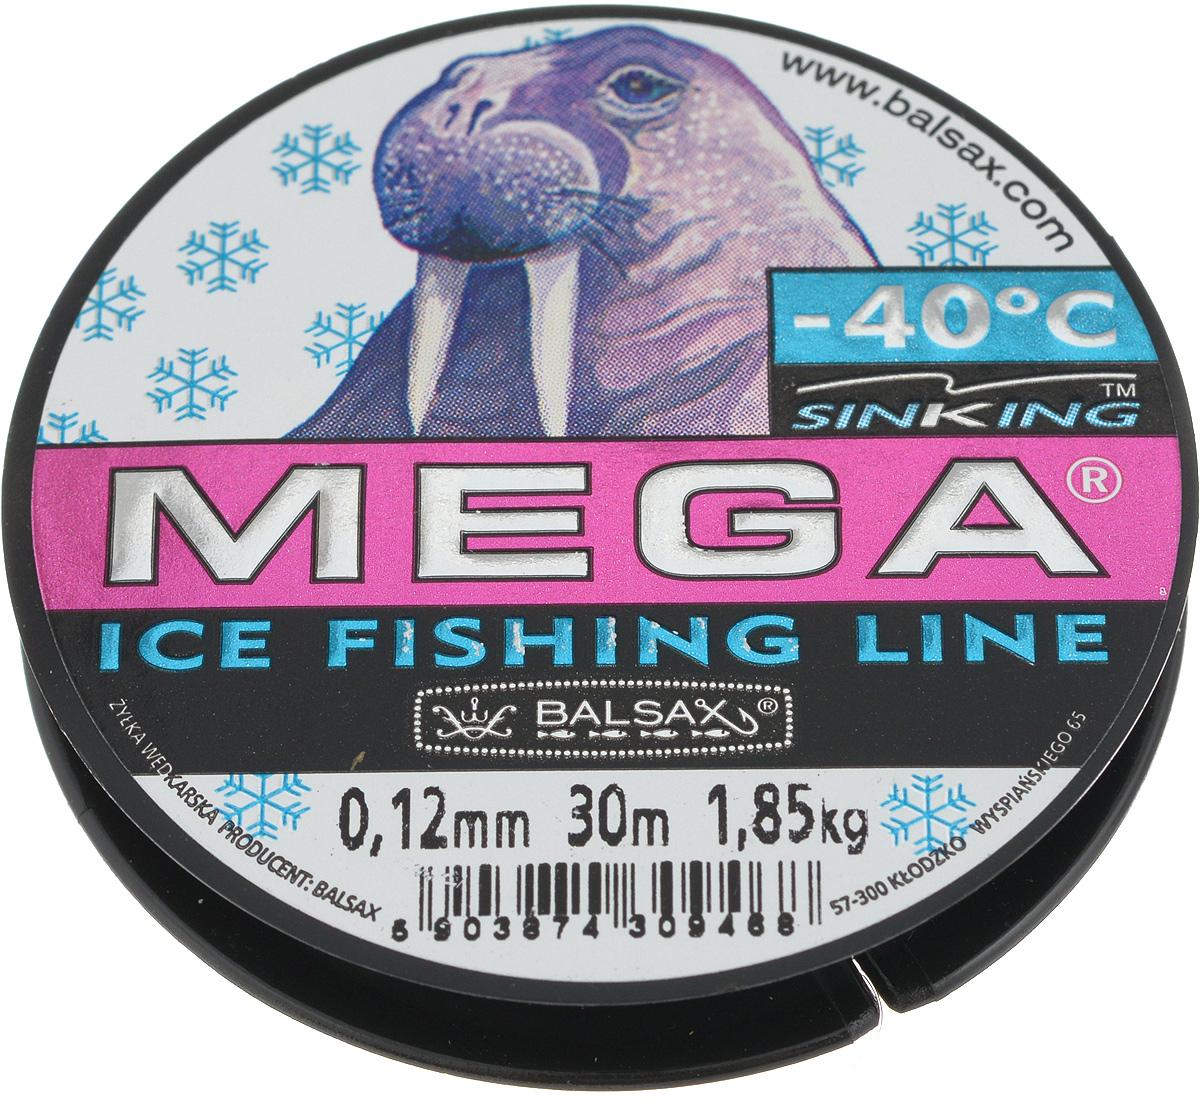 Леска зимняя Balsax Mega, 30 м, 0,12 мм, 1,85 кг леска зимняя balsax aurora 30 м 0 10 мм 1 4 кг